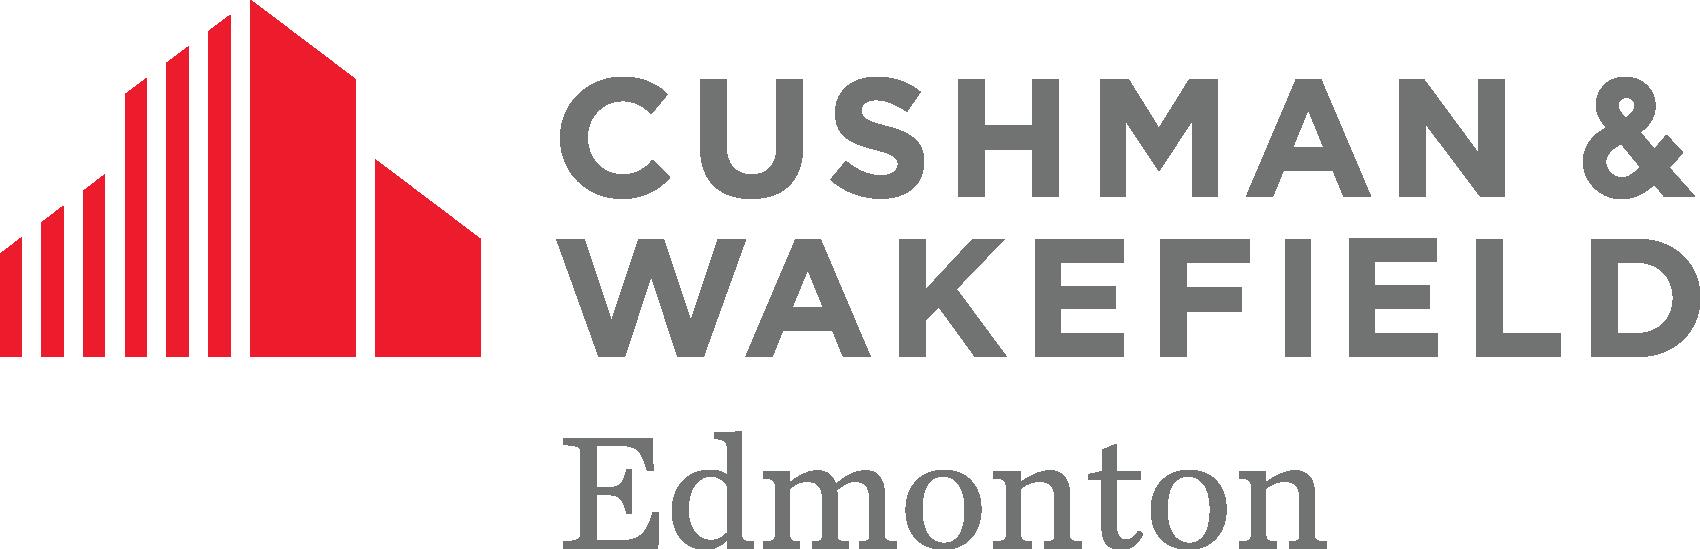 Cushman & Wakefield Edmonton